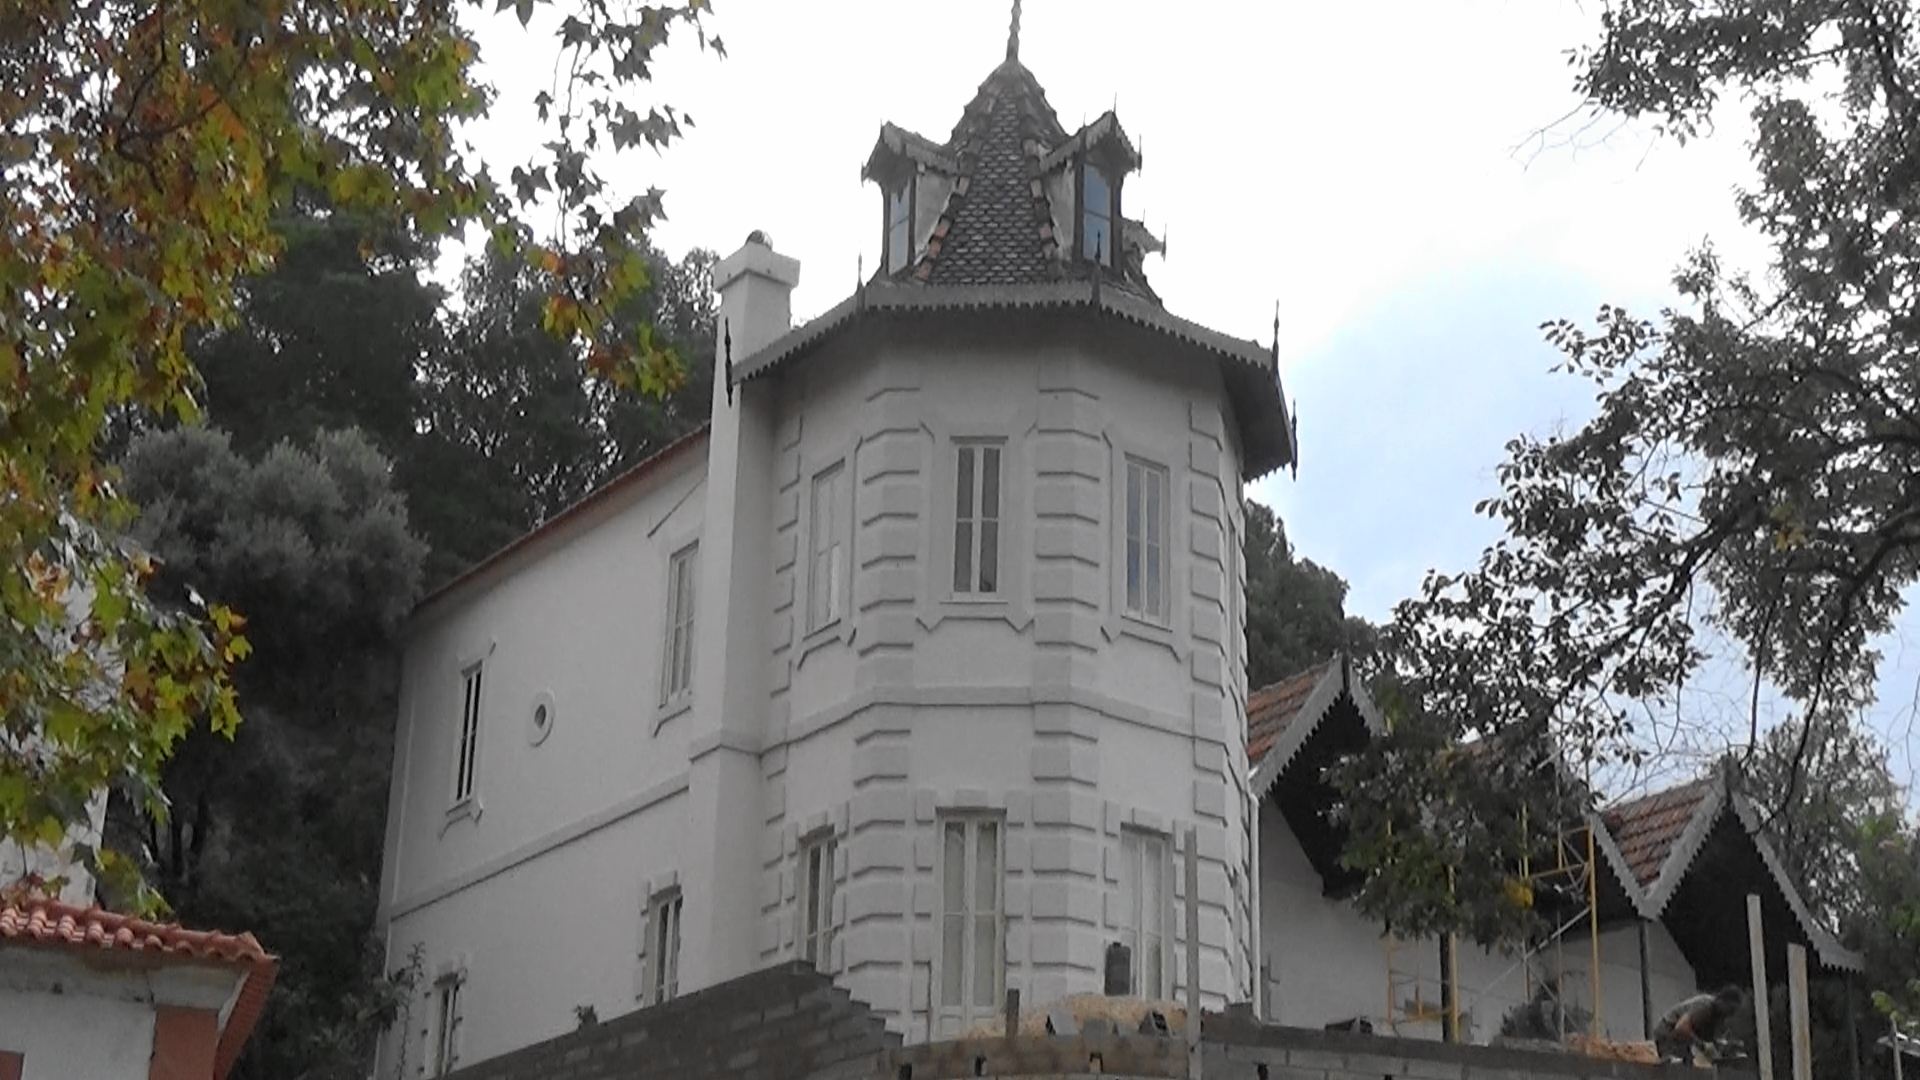 quirky buildings in caldas de monchique